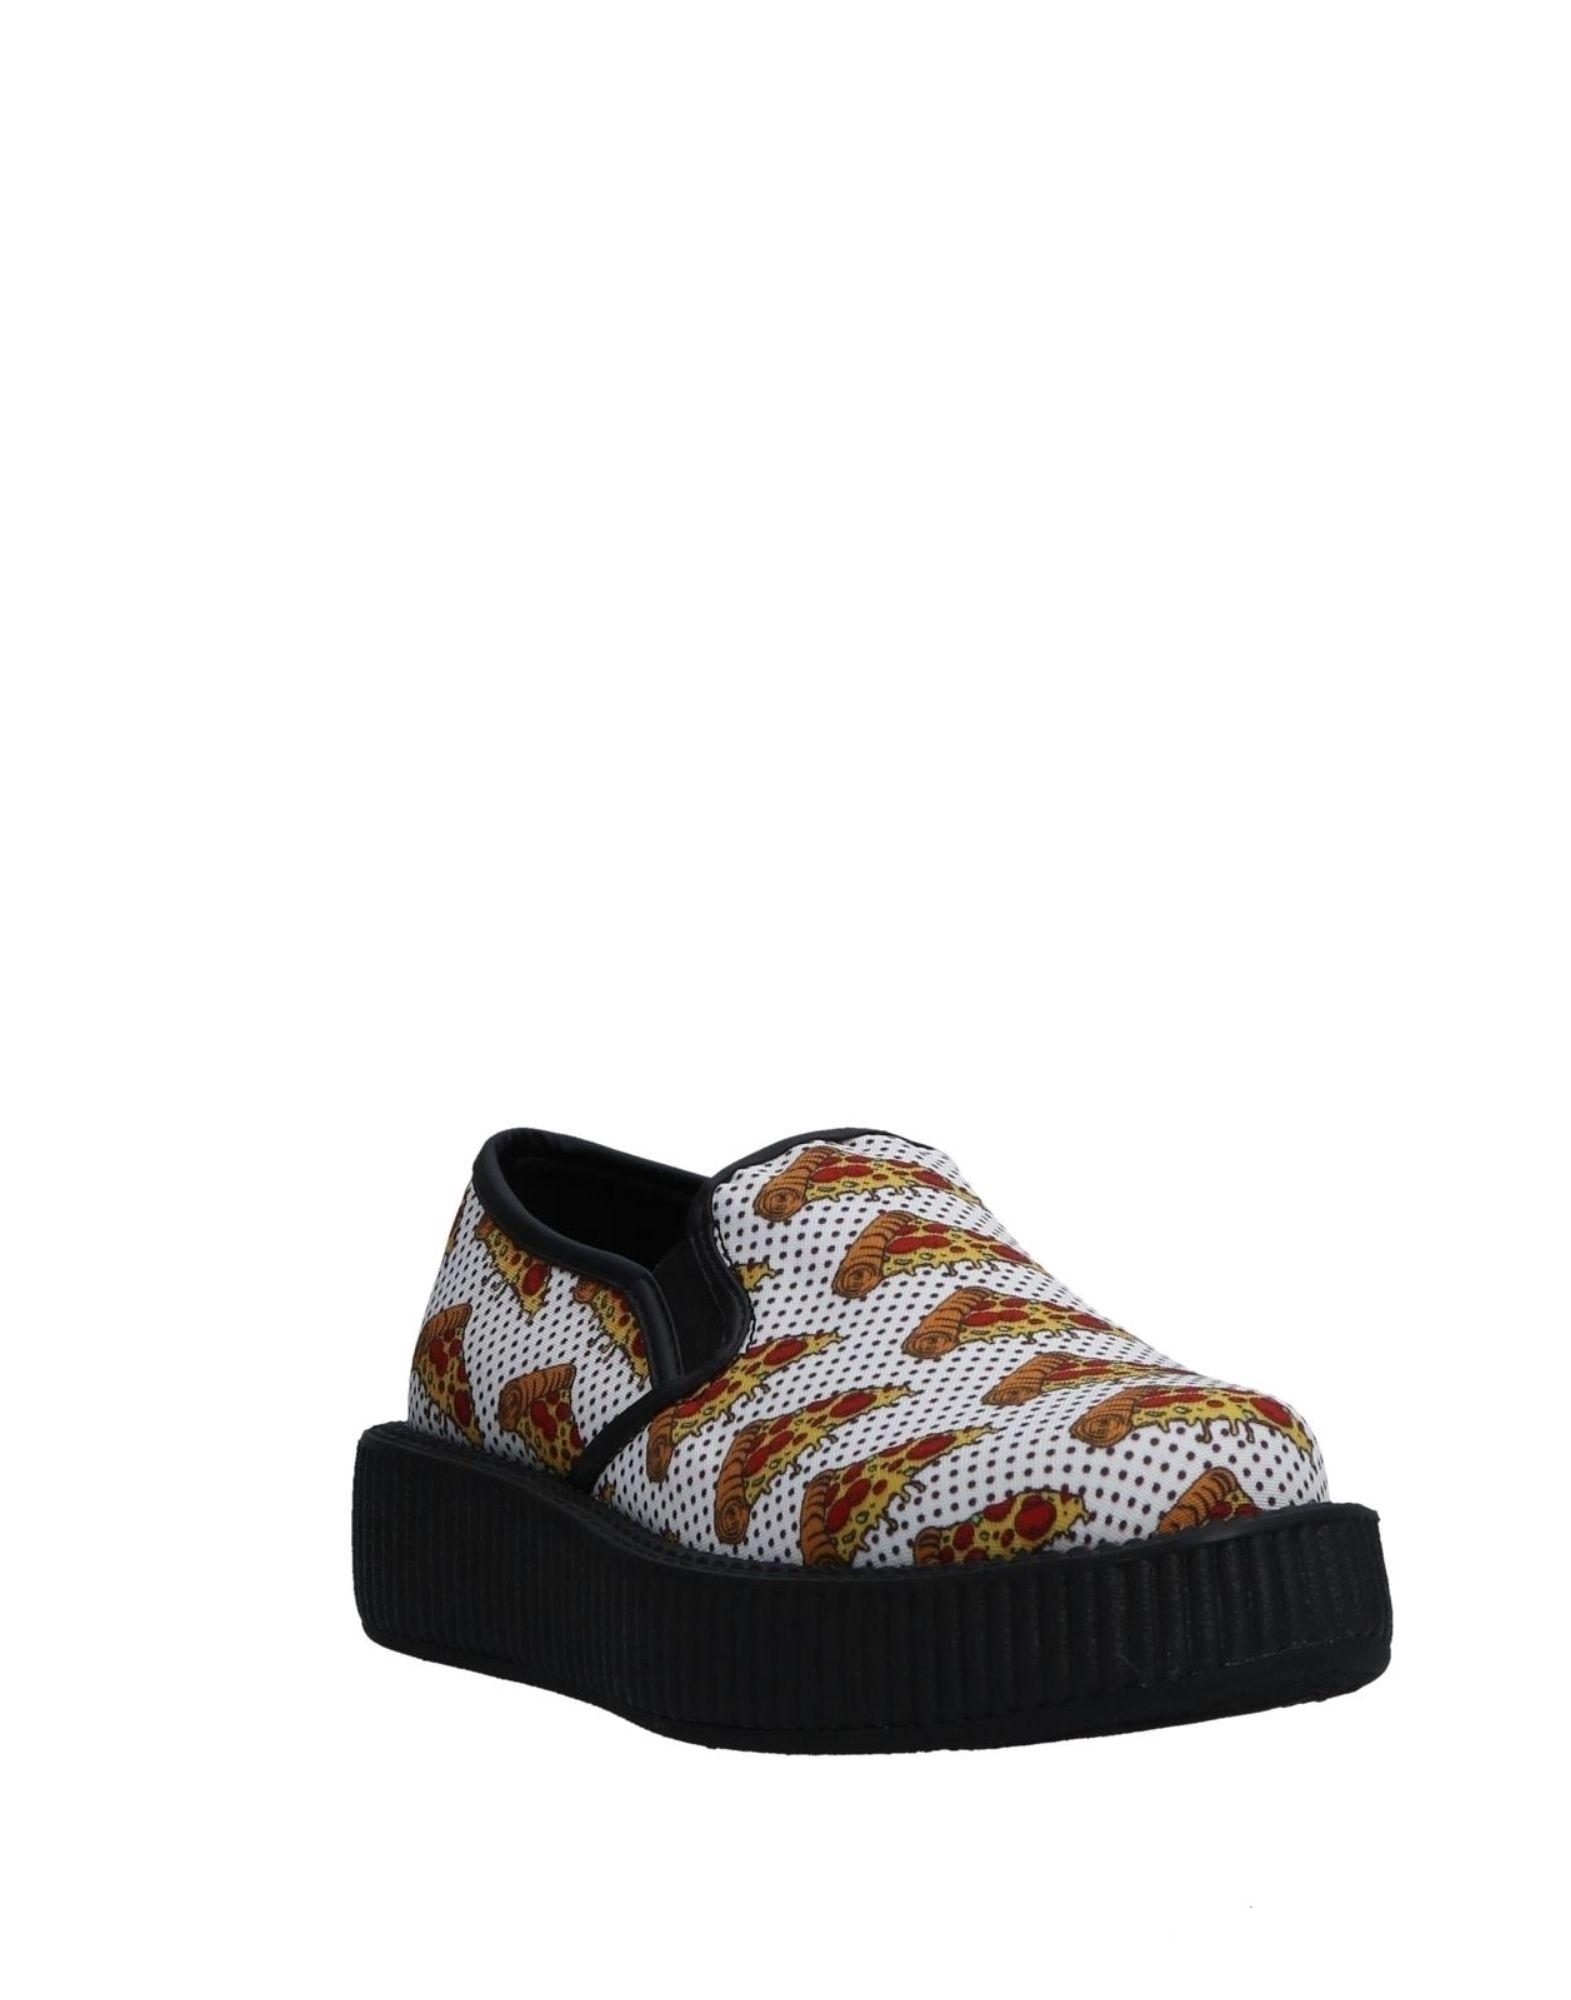 T.U.K Sneakers Sneakers T.U.K Damen  11528191BP  4eea92